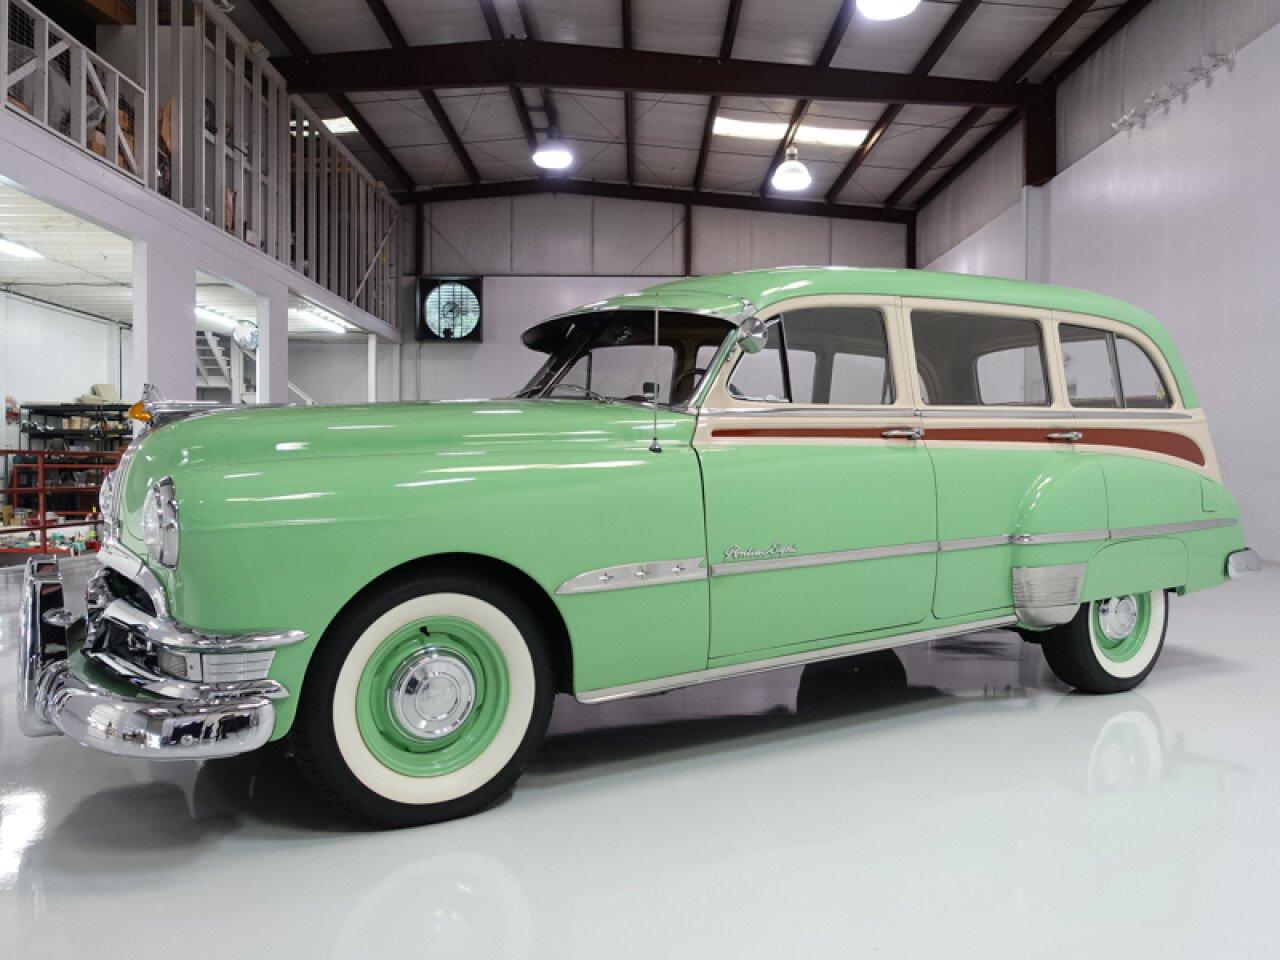 1951 Pontiac Coupe For Sale: 1951 Pontiac Streamliner For Sale Near Saint Louis